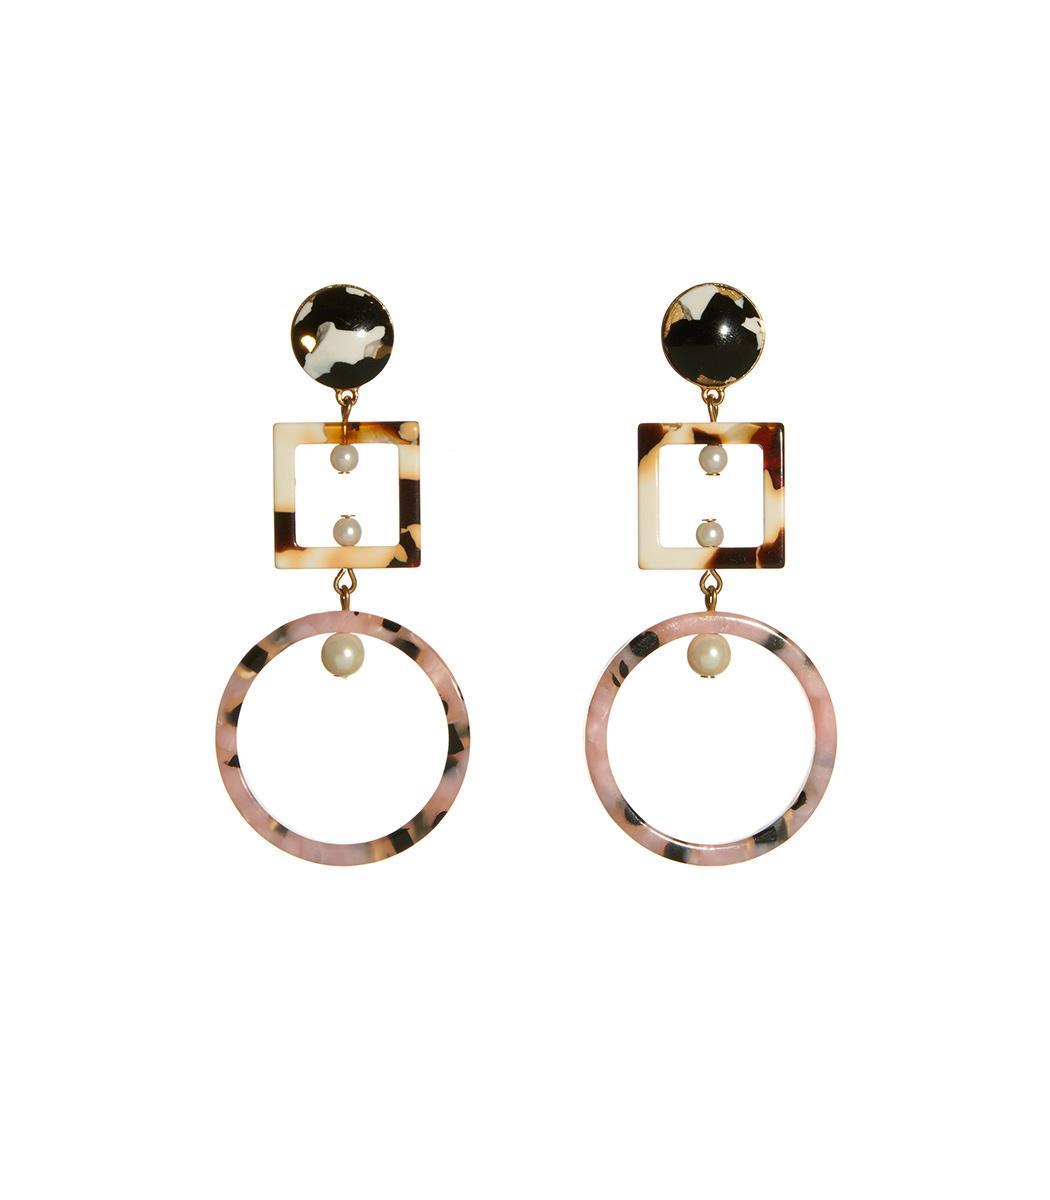 Lele Sadoughi Cage Imitation Pearl Drop Earrings In Marble